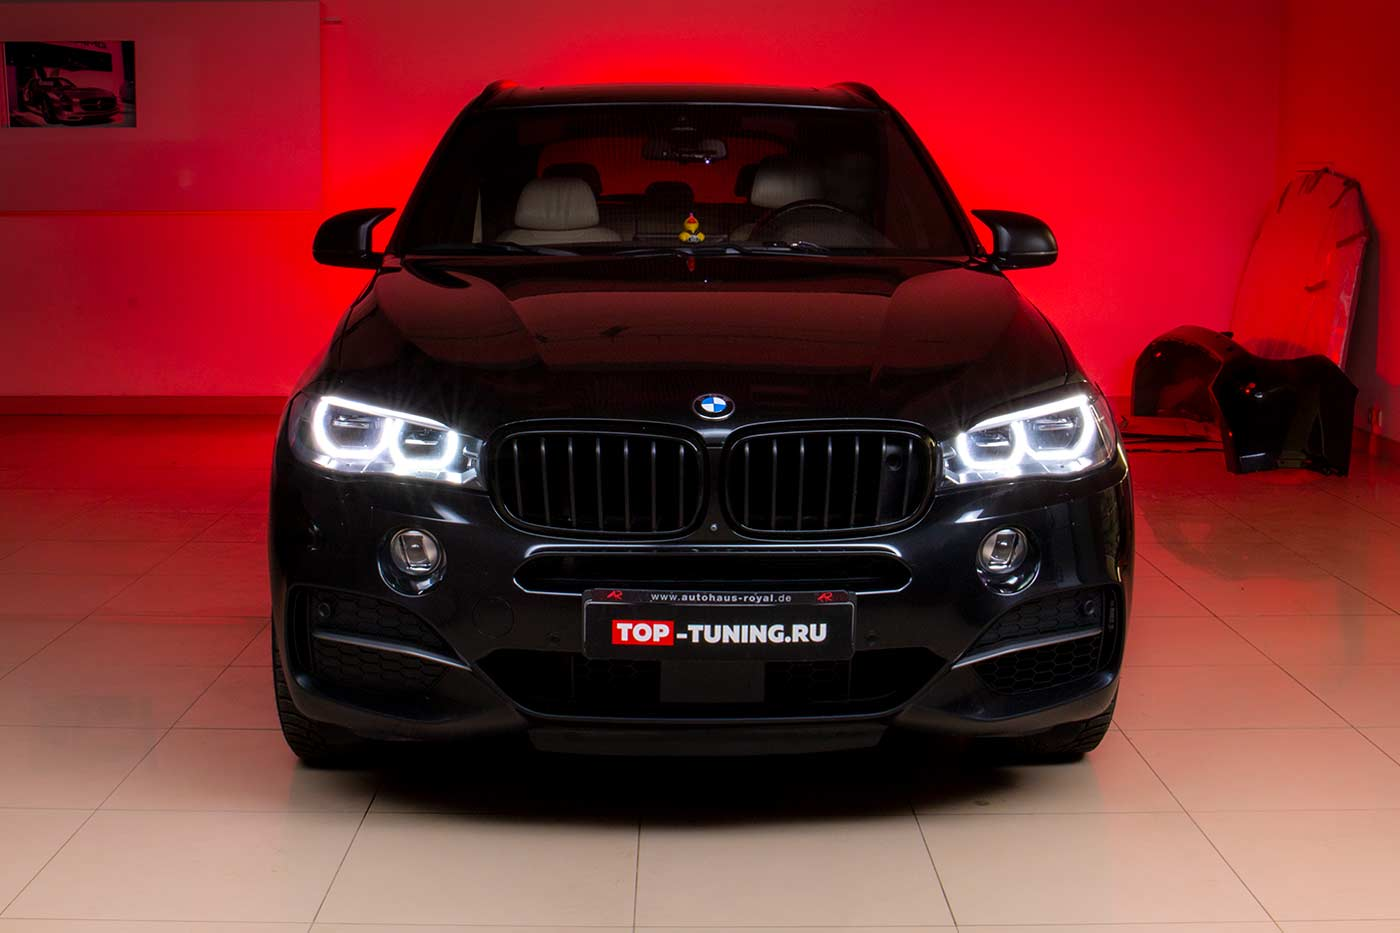 Новый М-бампер F85 для BMW X5 F15 + многое другое